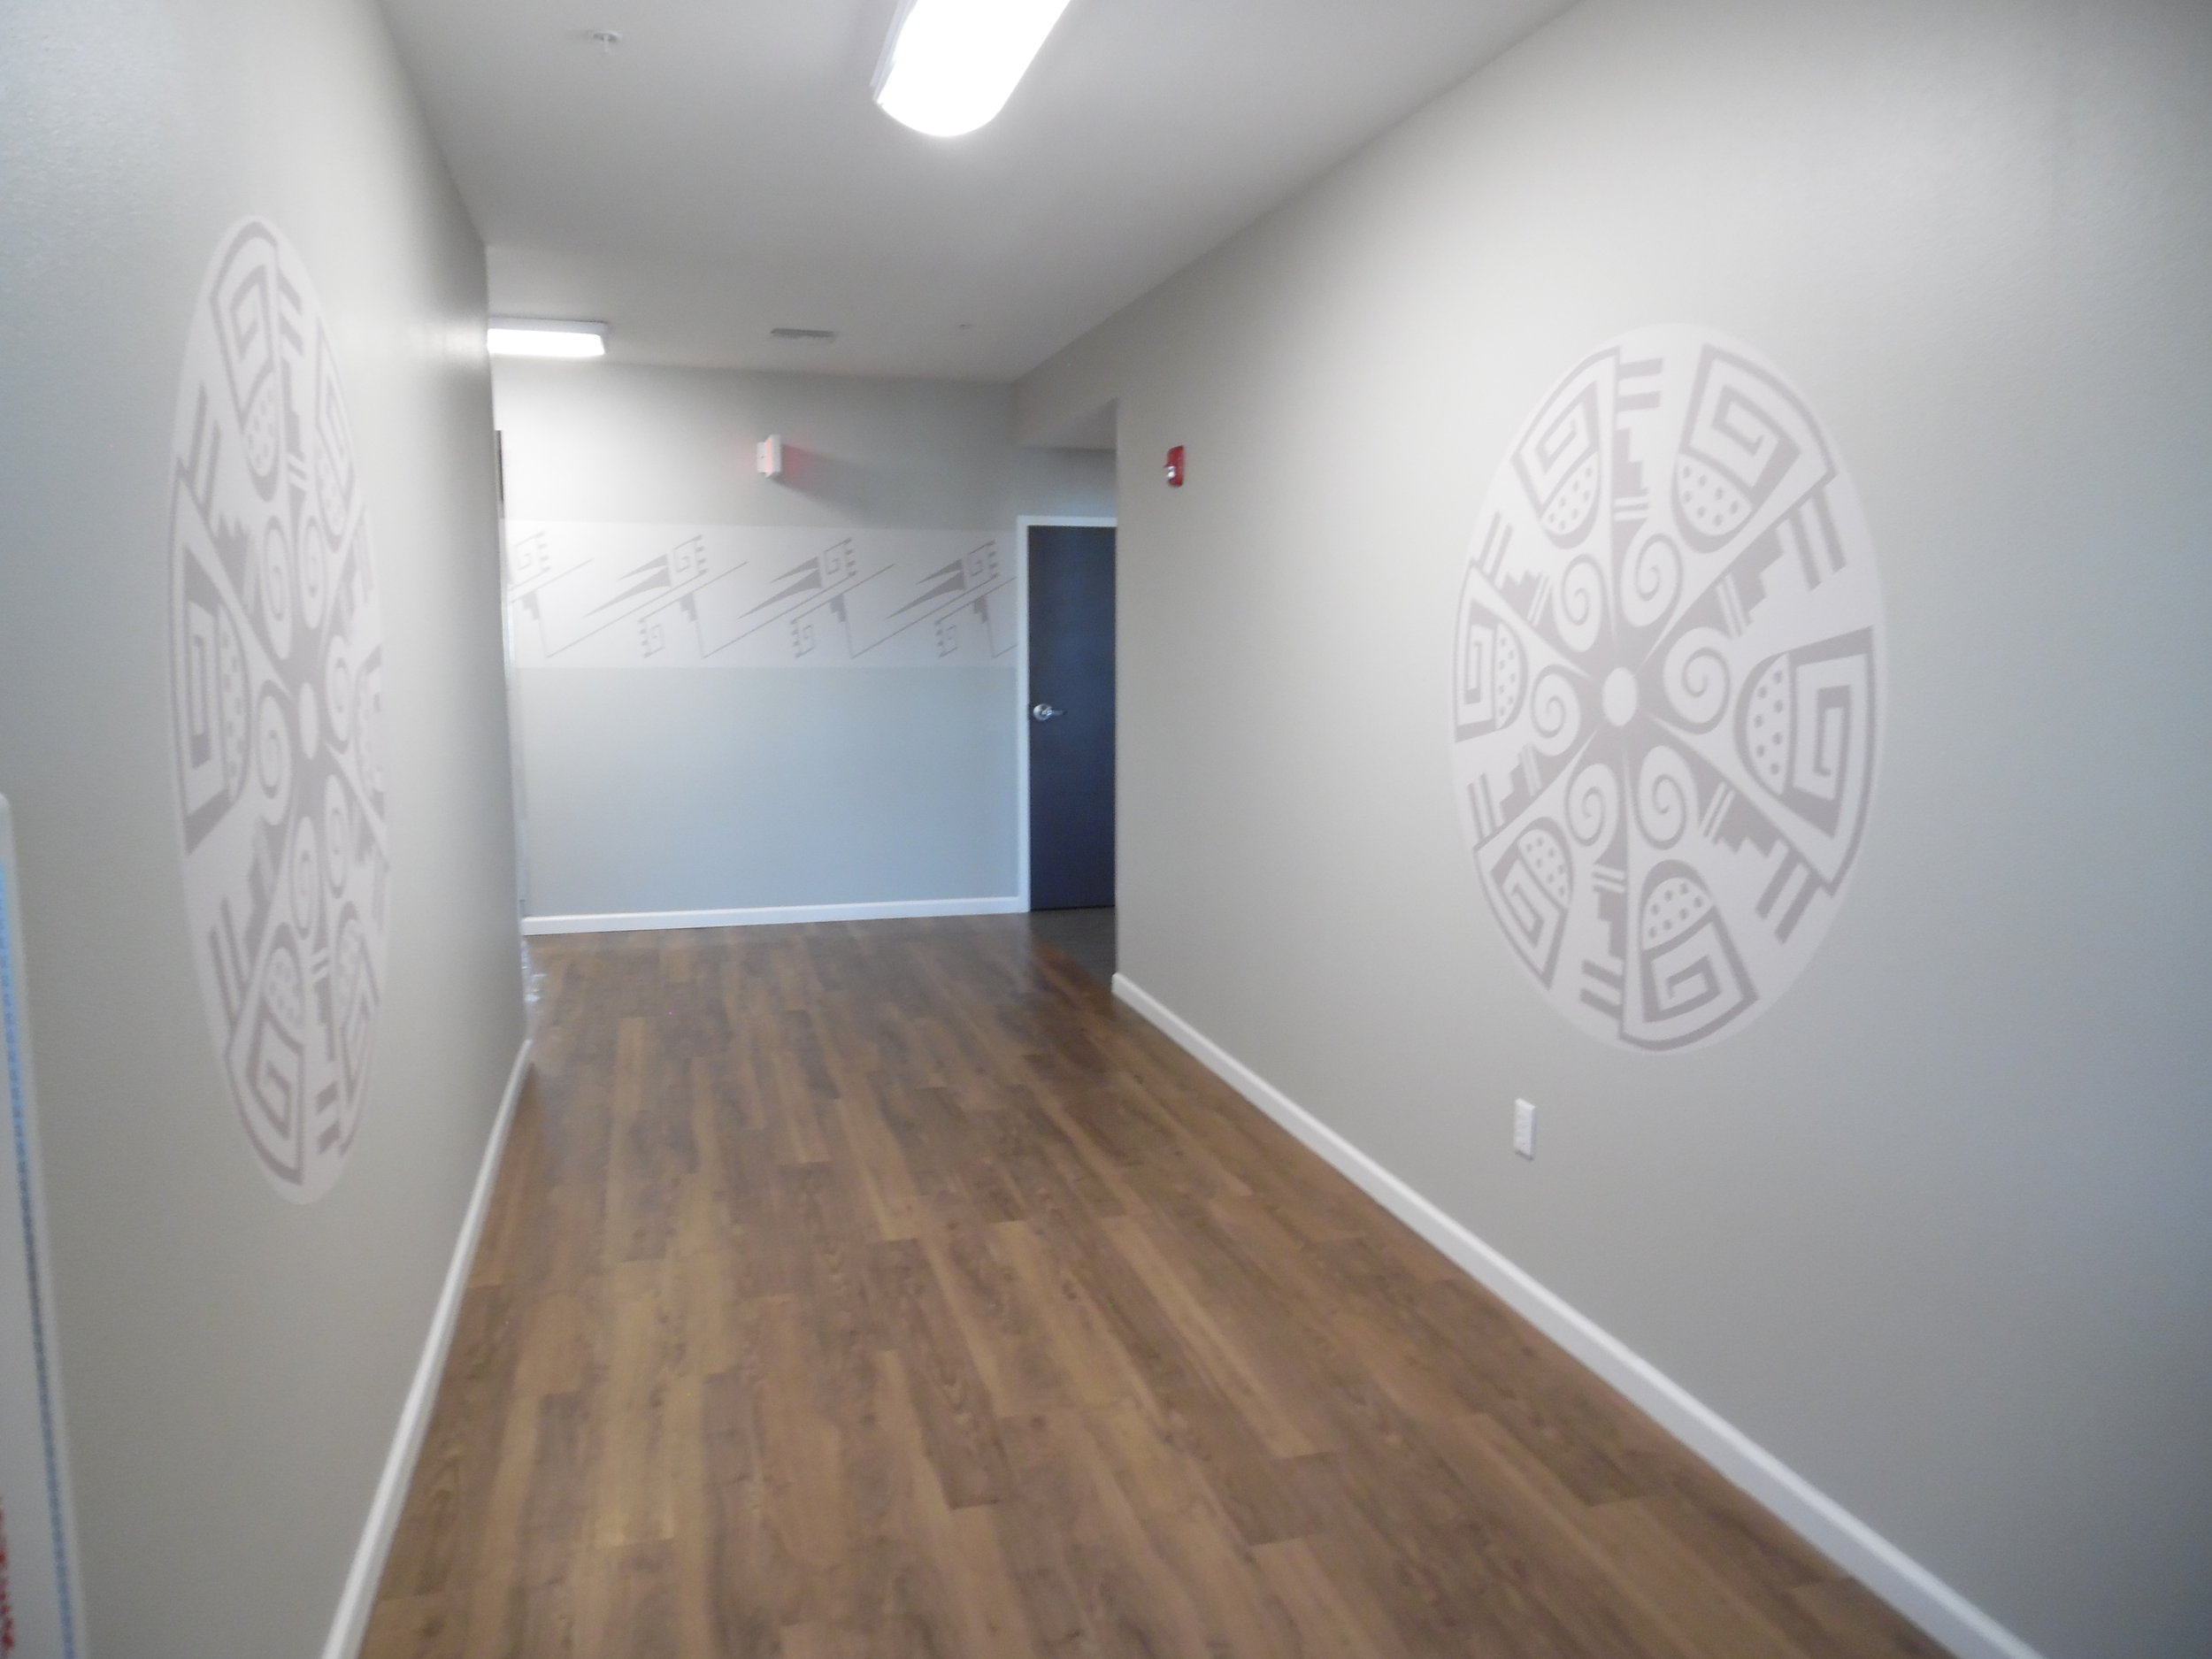 Corridor with Hopi art mural by Hopi artist Michael Adams